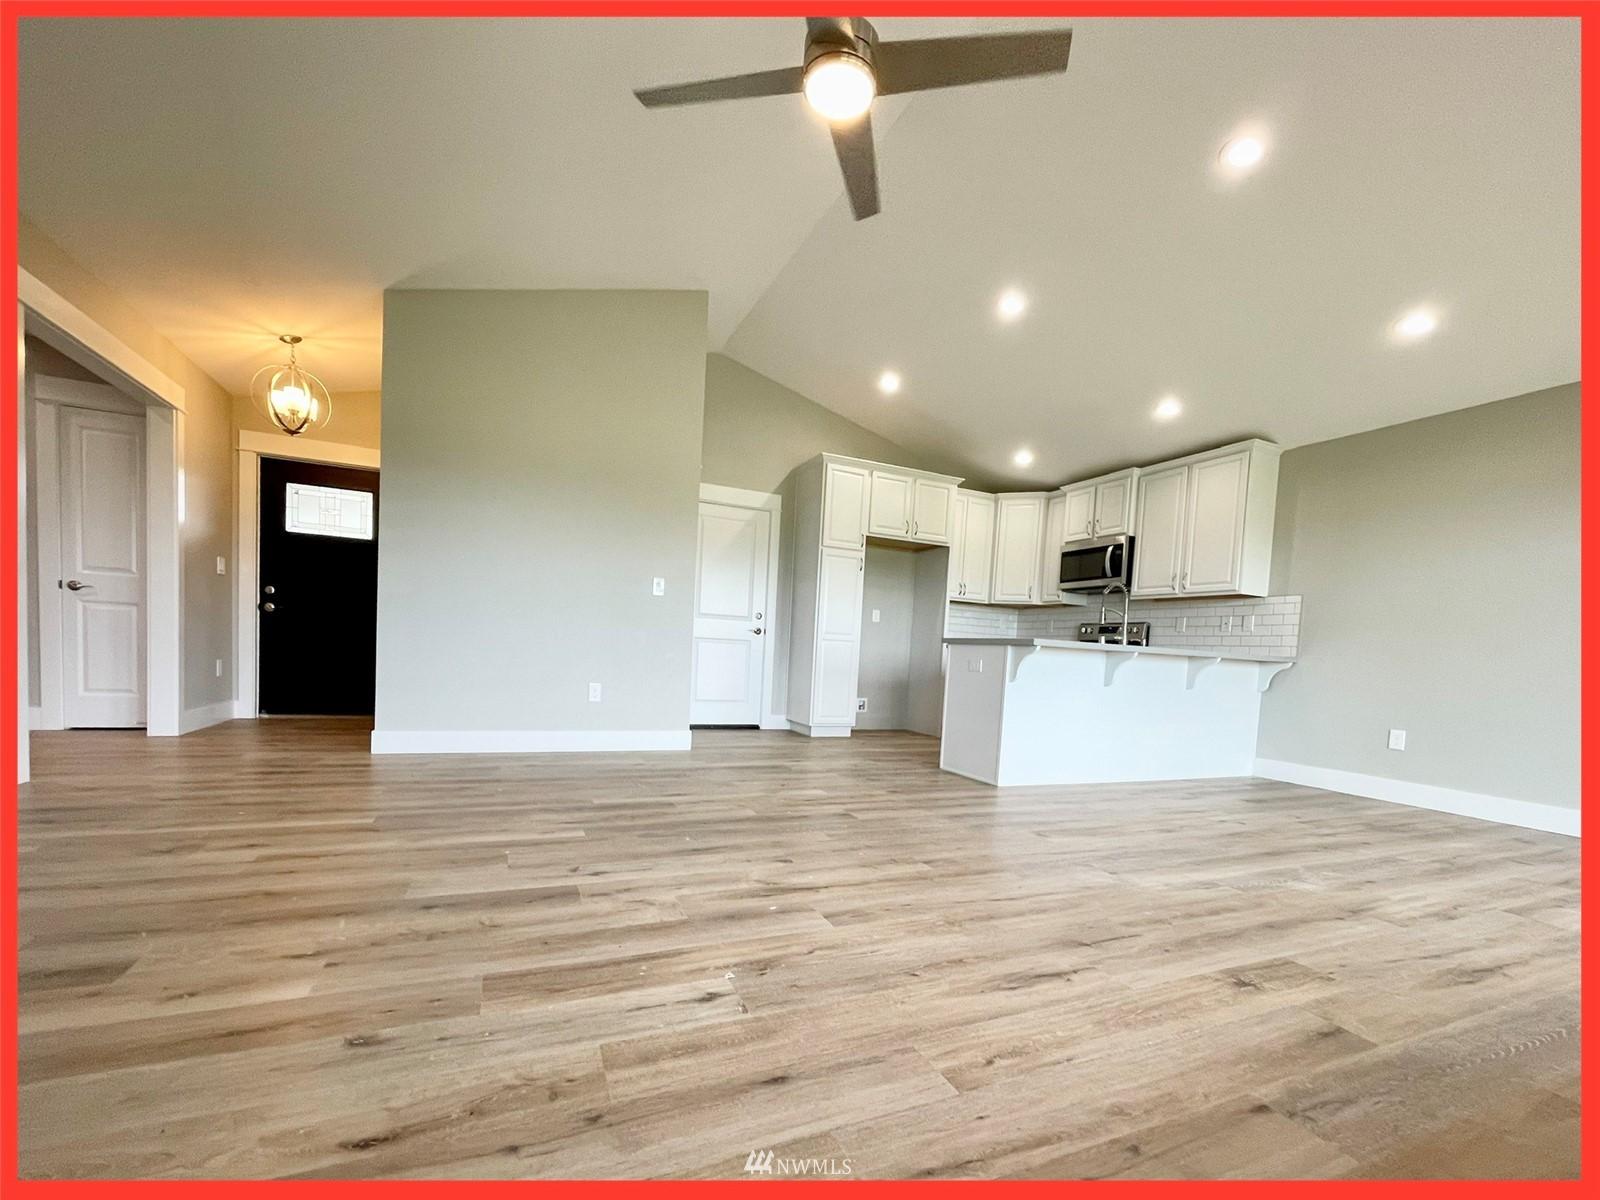 Photo 16 571 Puffin Ave NE Ocean Shores WA 98569